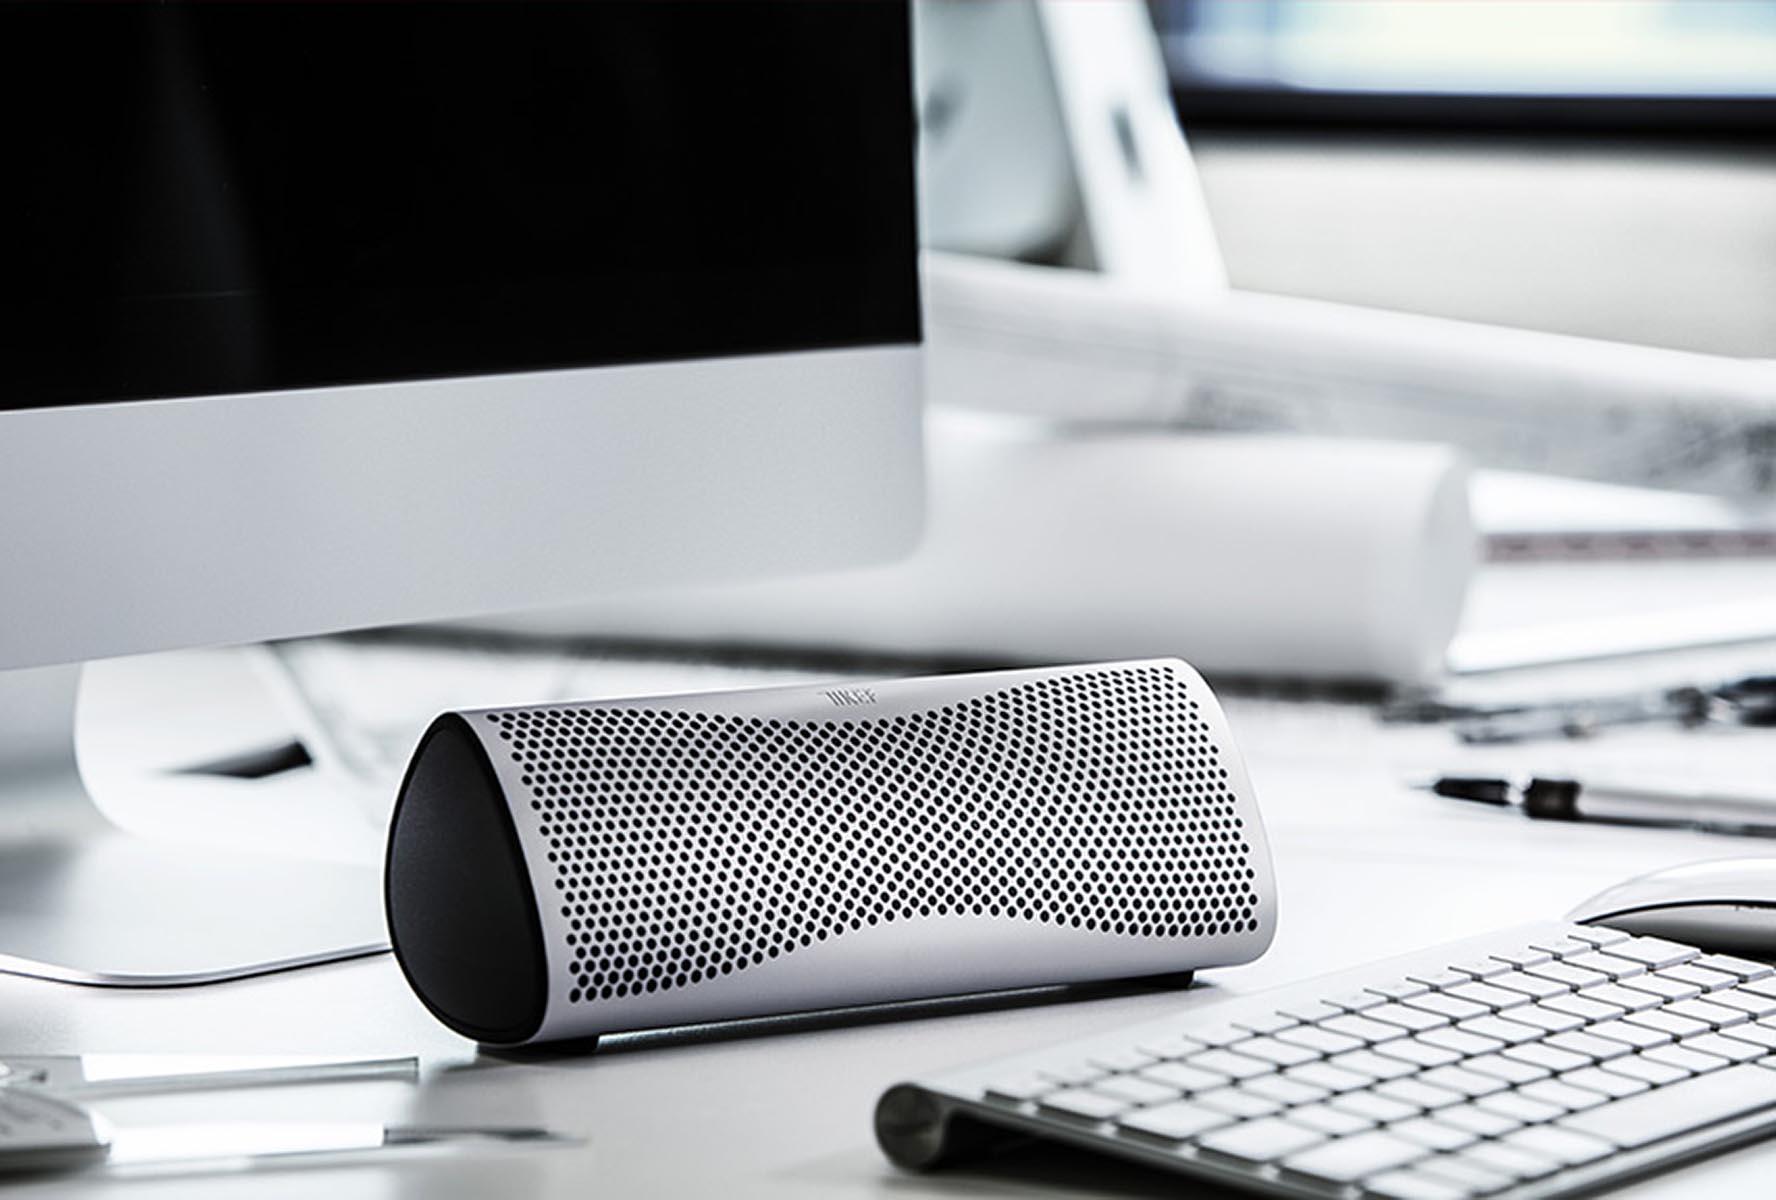 kef-muo-speaker-ross-lovegrove-computational-design-andrea-locatelli-10.jpg